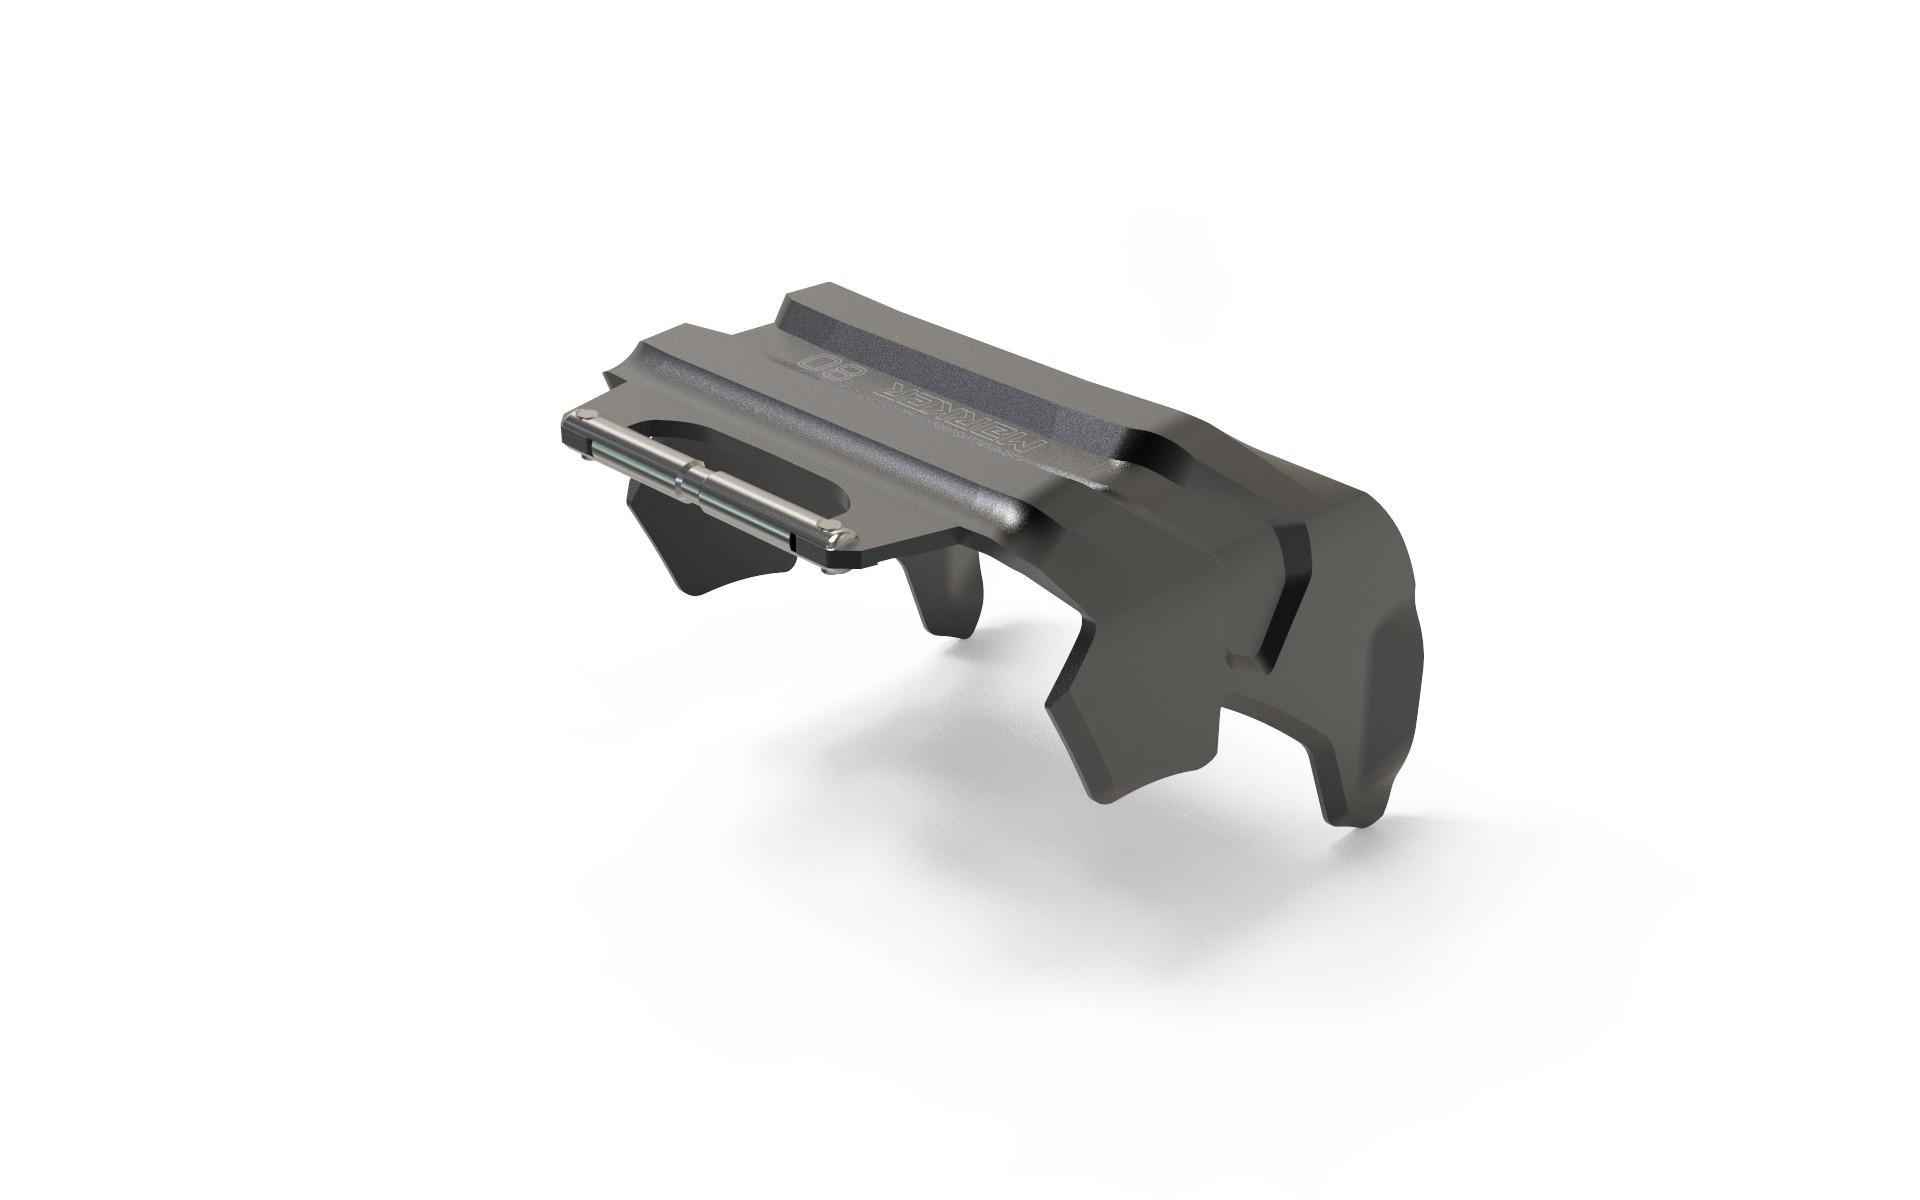 Crampon Pintech 80mm (ski width 66-80mm)